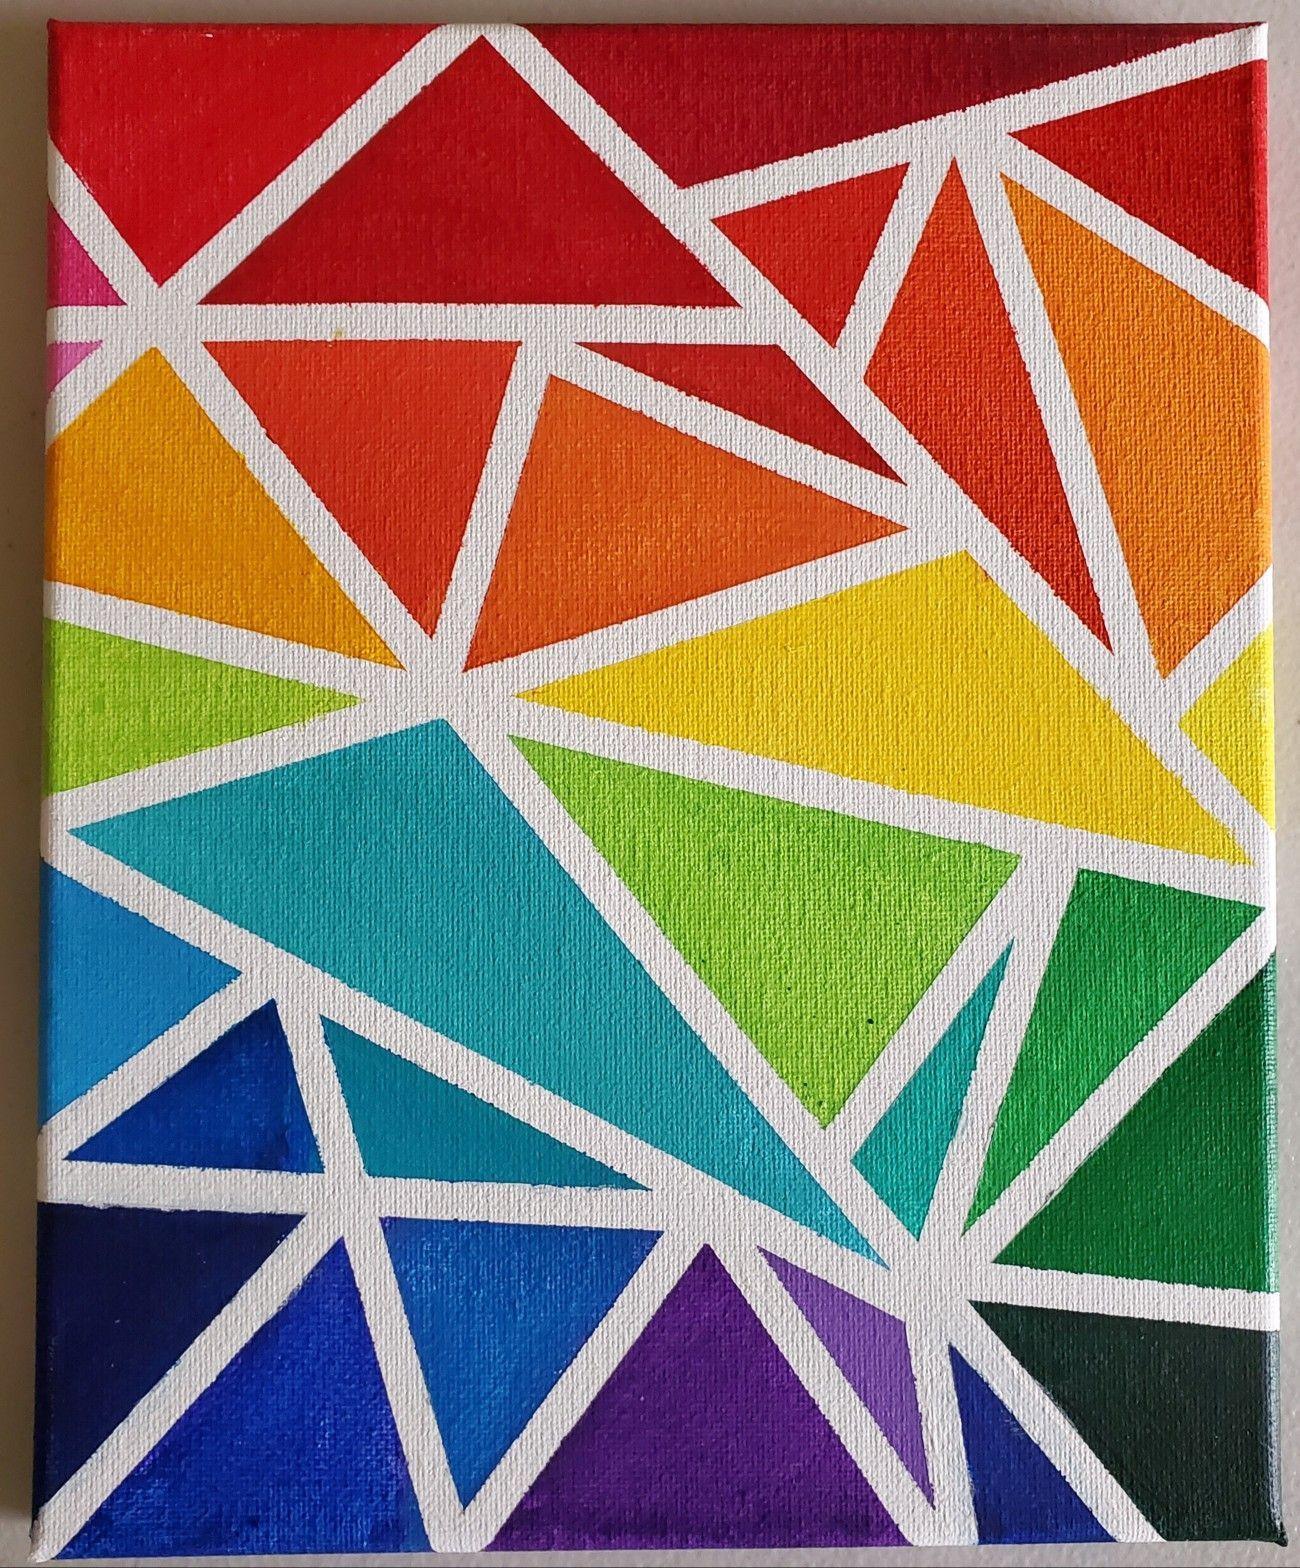 Geometric Rainbow Art Using Masking Tape Maskingtapeart Made With Acrylic On 8x12 Canvas Triangles Mad Masking Tape Art Tape Wall Art Simple Canvas Paintings